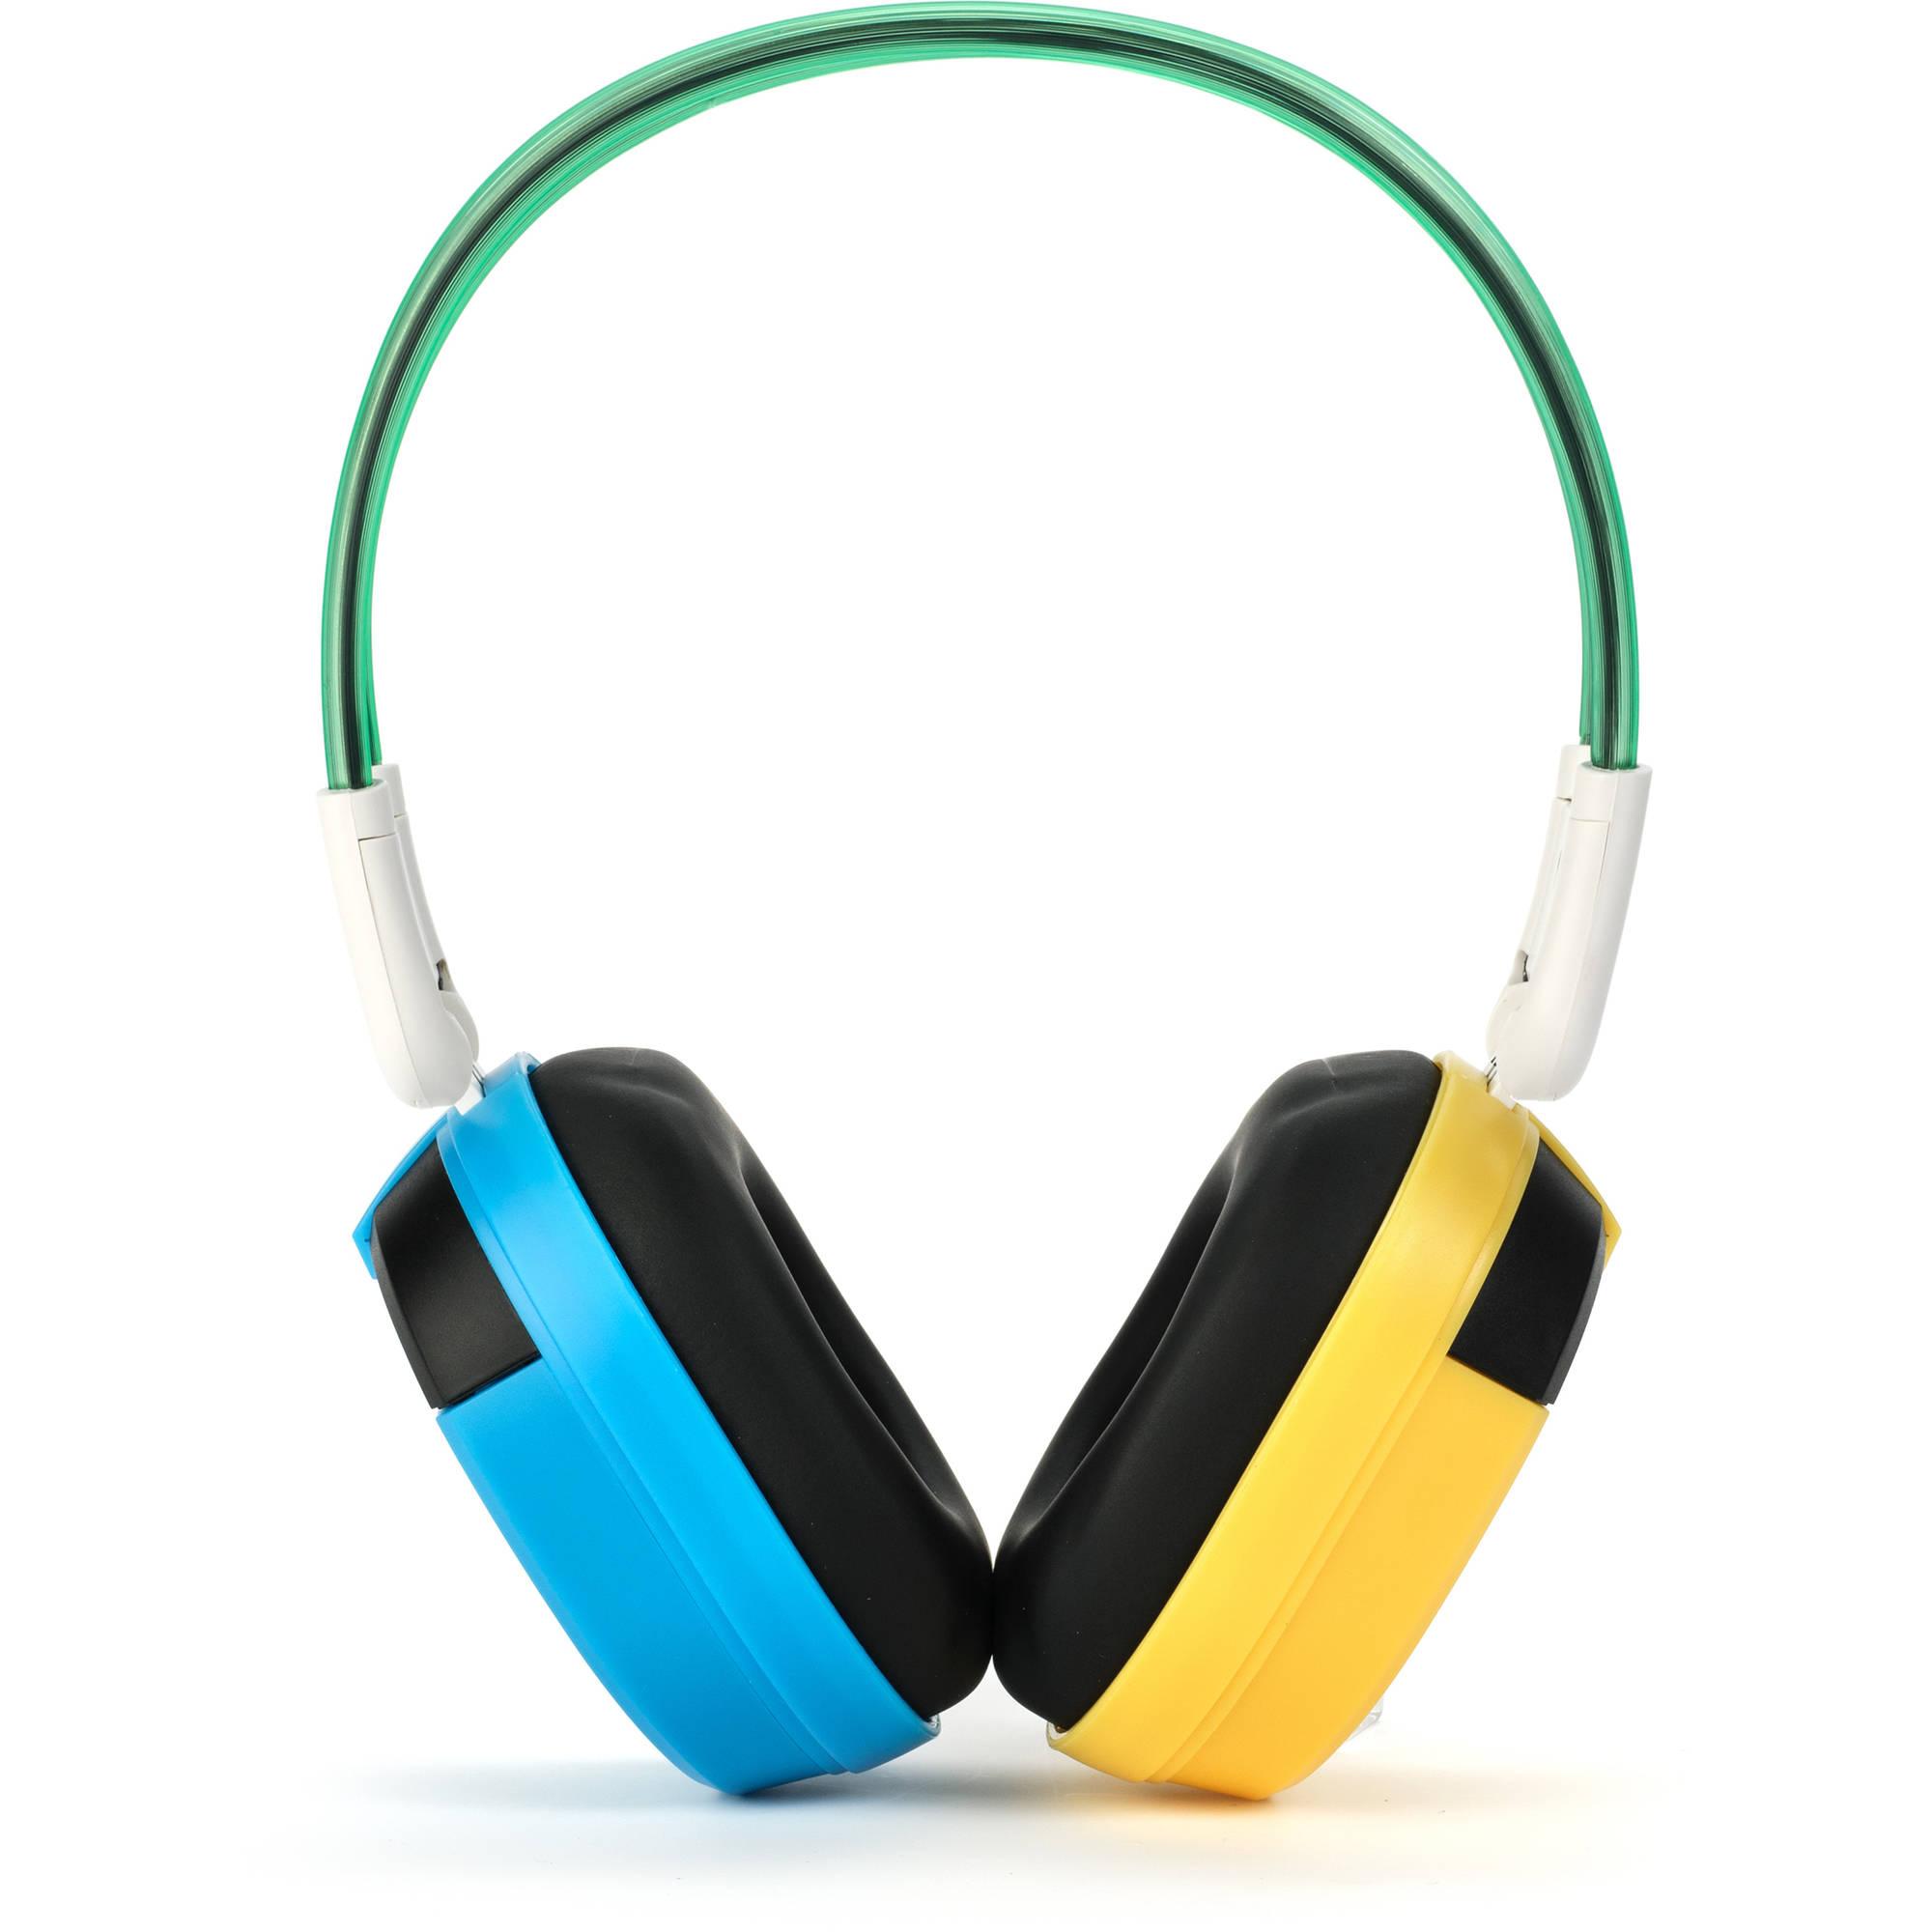 Bravo View IH-03A - KID FRIENDLY Automotive IR Wireless Headphones (Blue/Yellow)